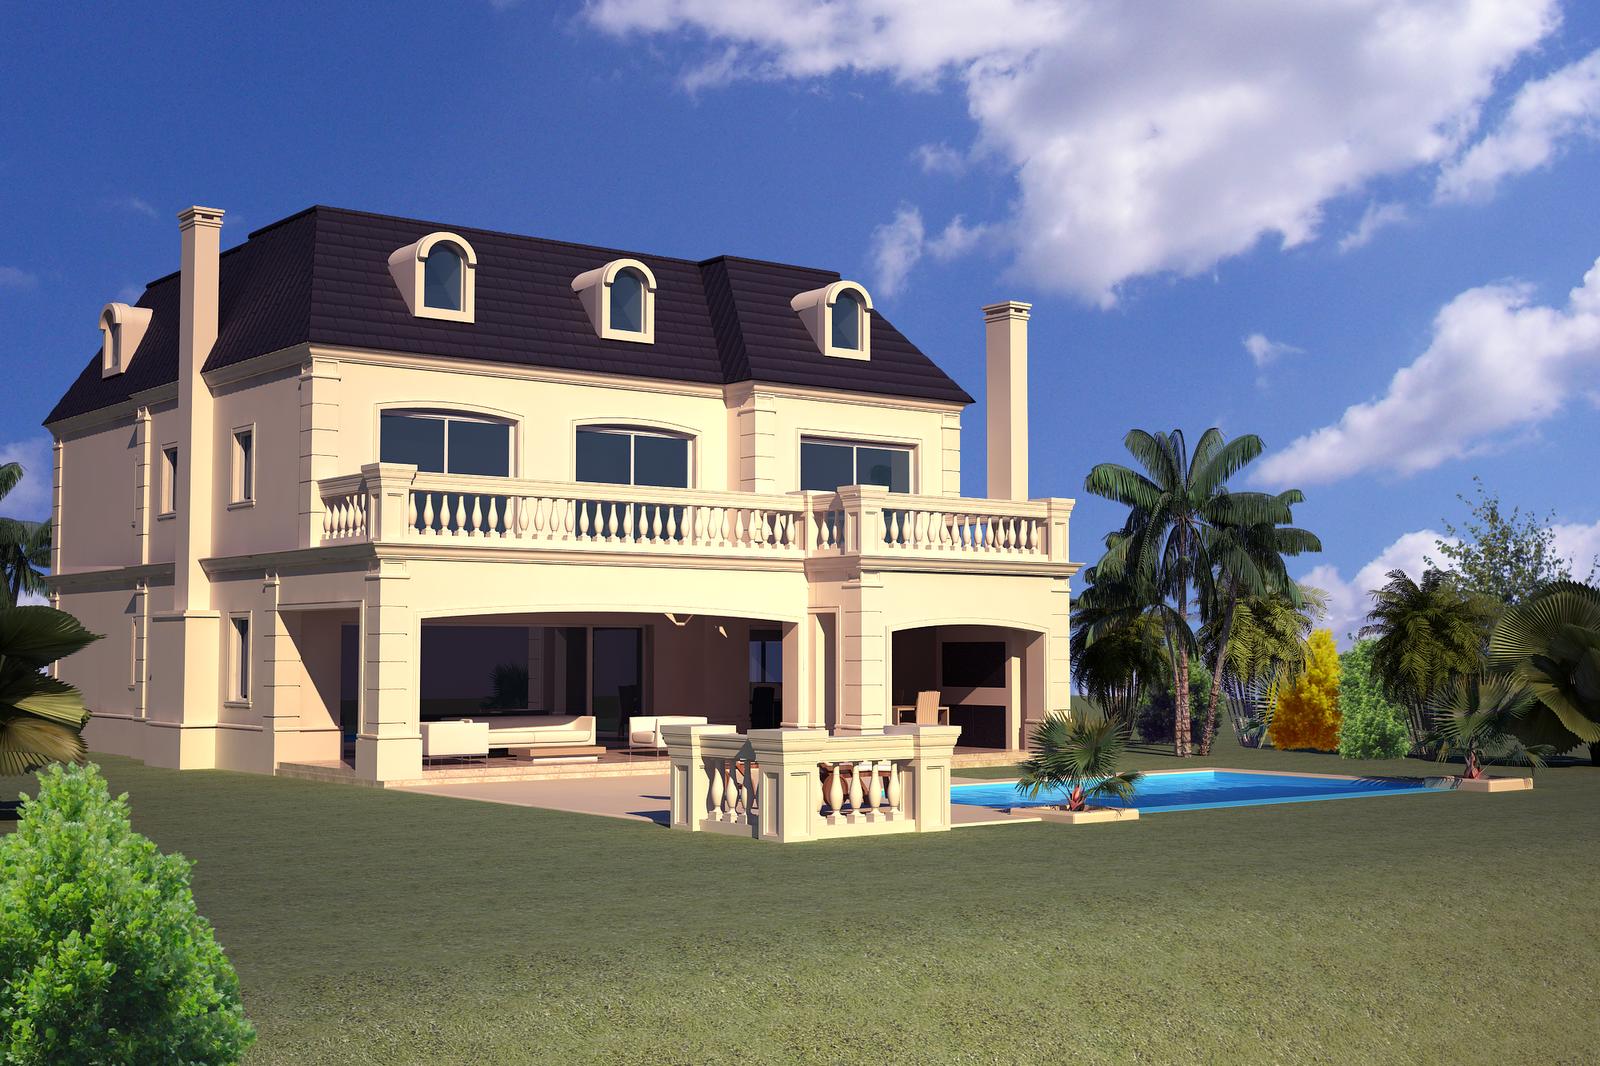 3d makers casas estilo frances nordelta proyectos que for Casas estilo frances clasico